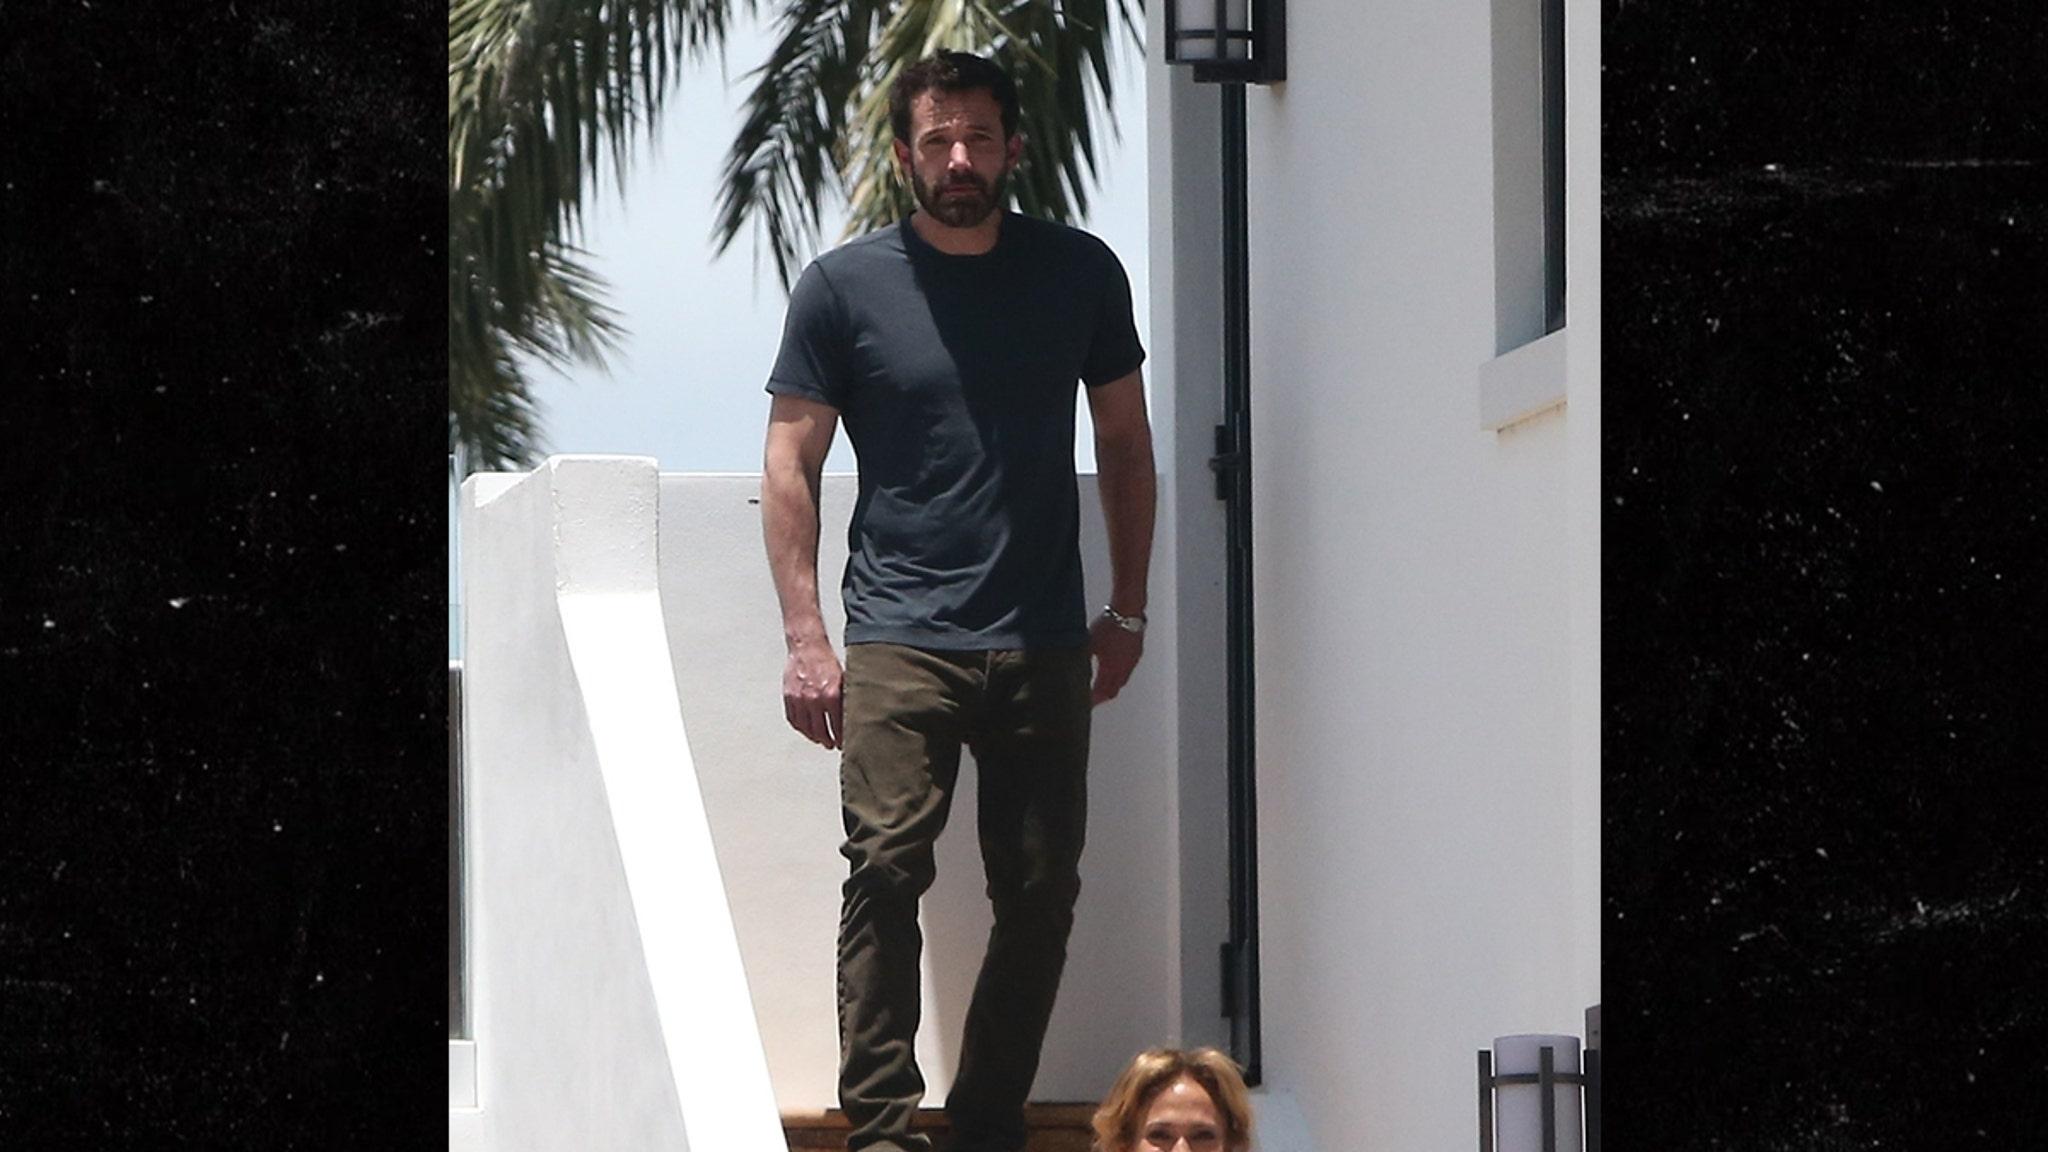 Ben Affleck, J Lo Pictured Together for First Time Since Rekindling